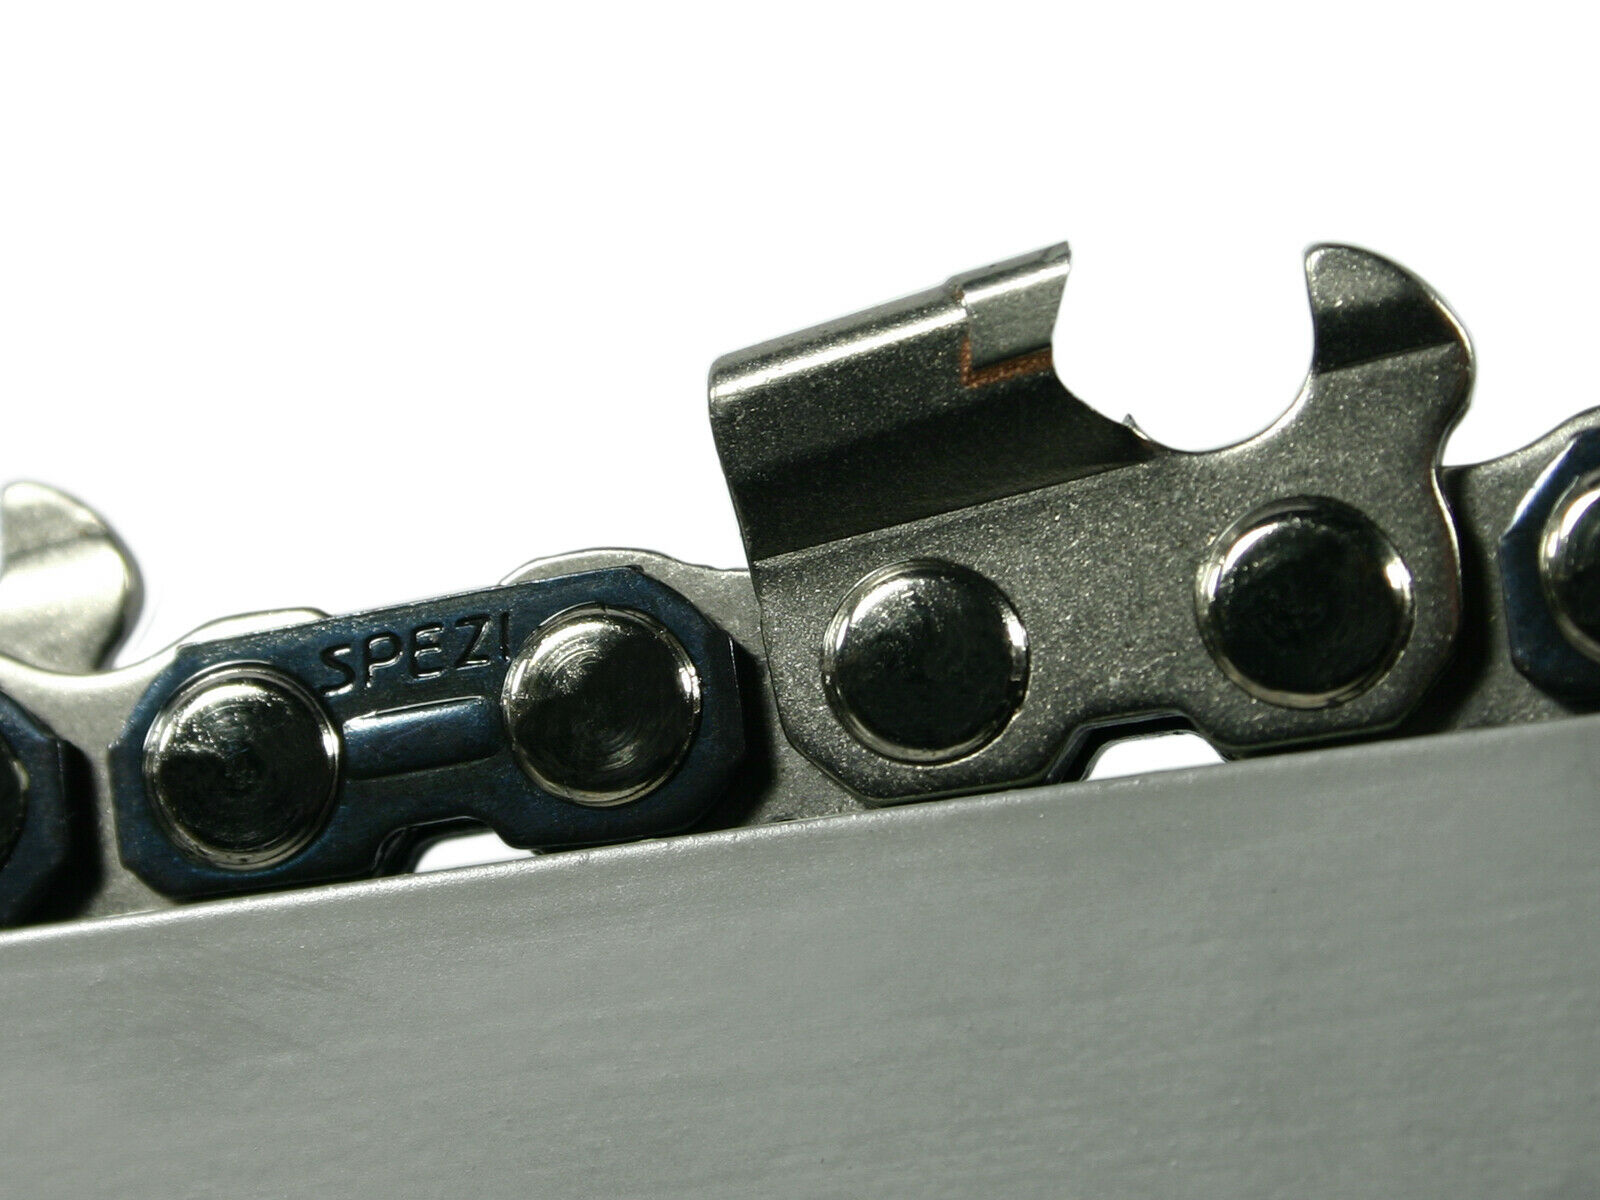 Metal duro para sierra cadena compatible con still 066 MS 660 63 cm 3 8  84 TG 1,6 mm Chain